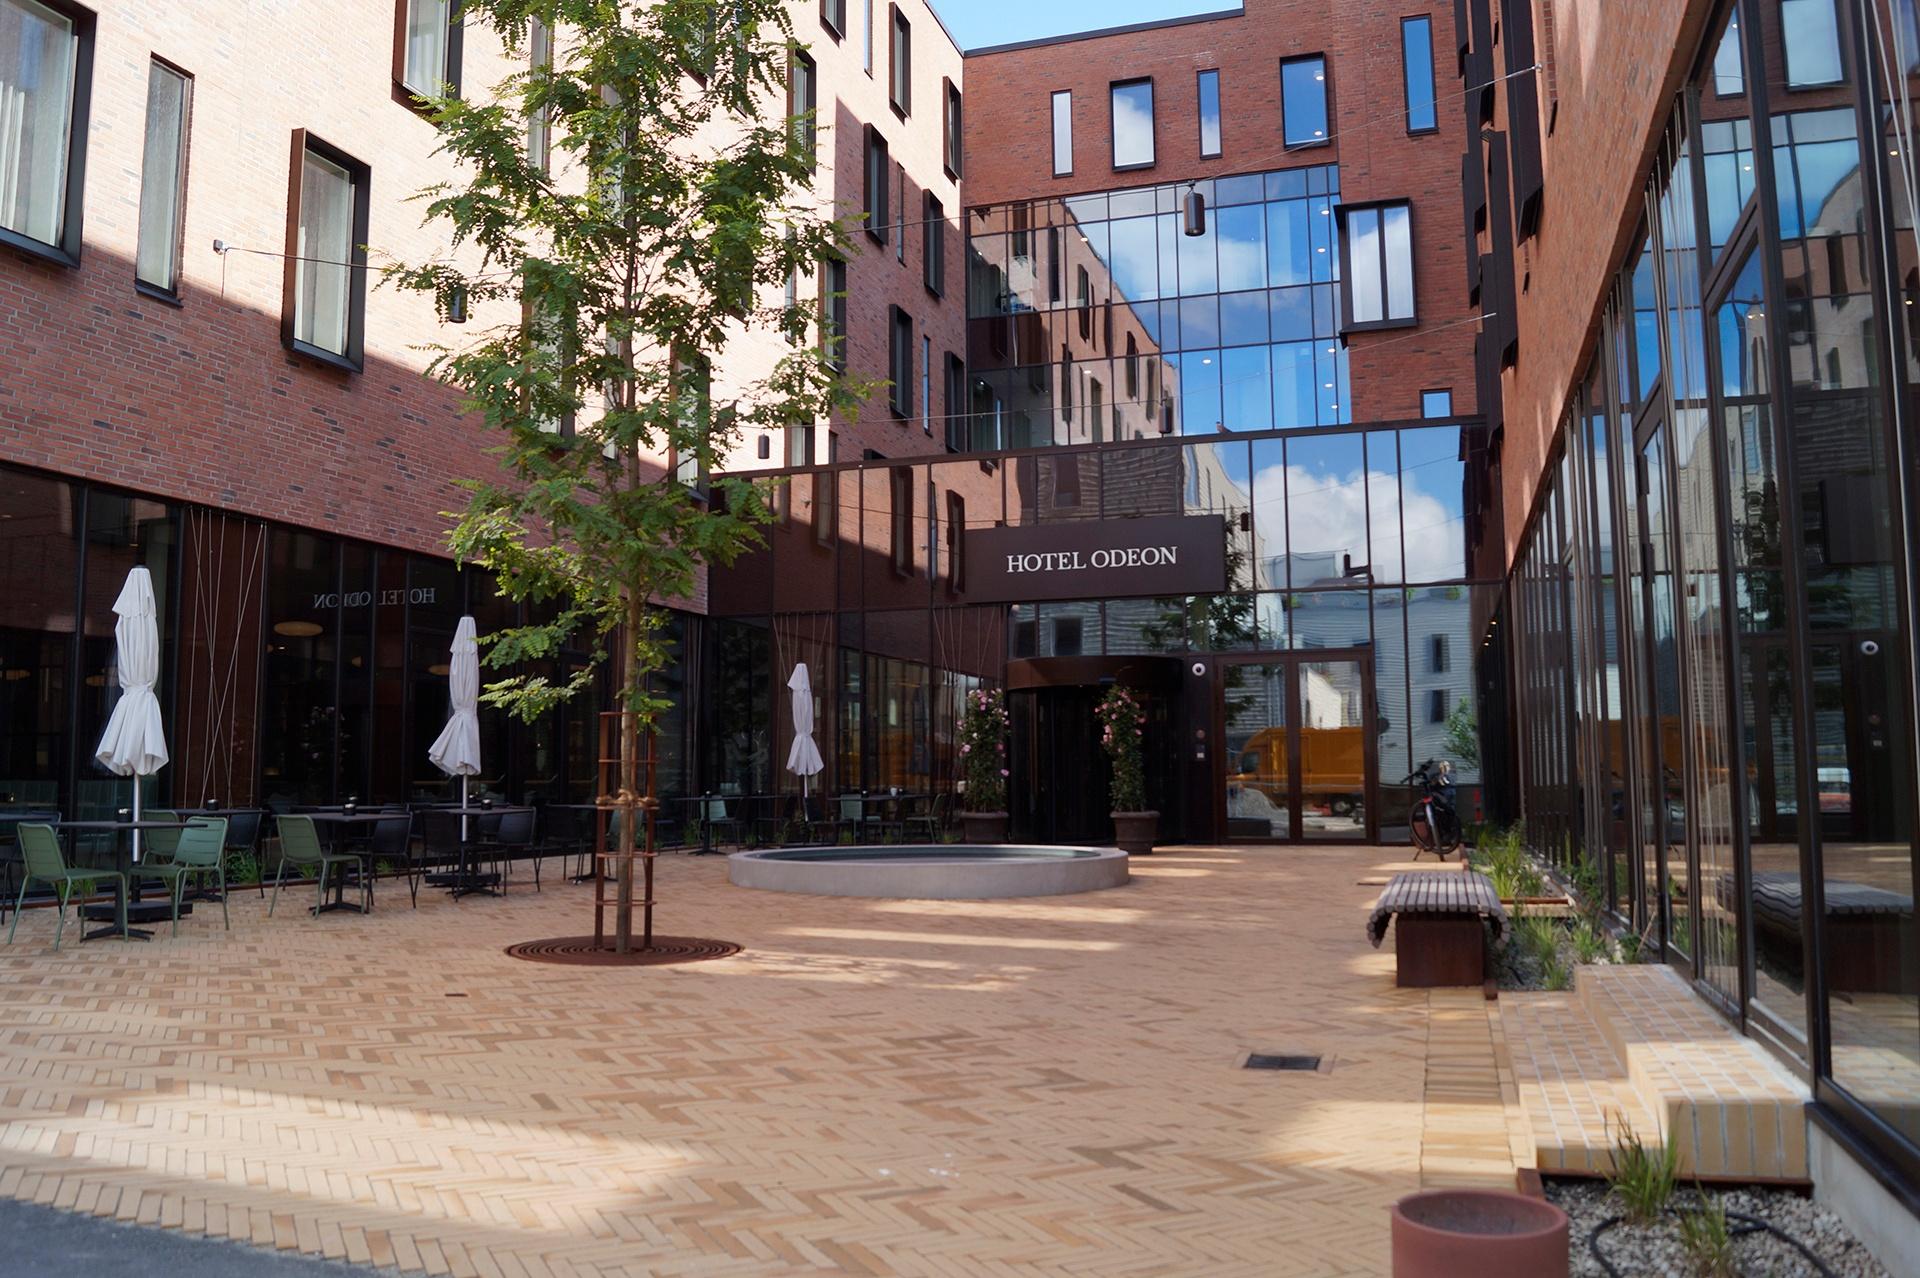 Frokostpladsen foran Odeon Hotel i Odense